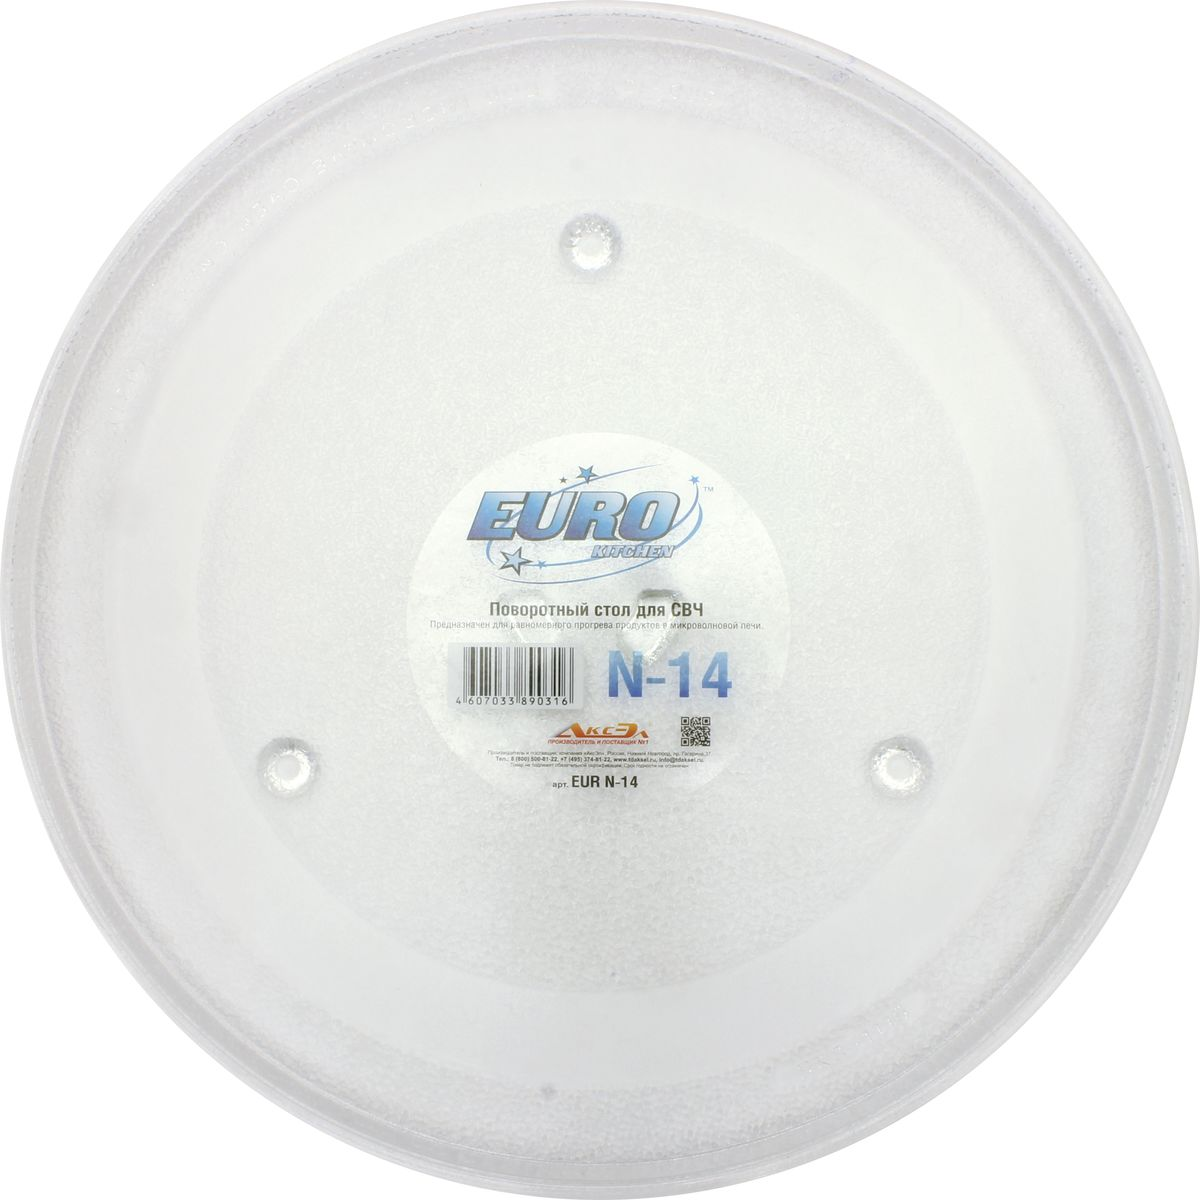 Euro Kitchen N-14 тарелка для СВЧN-14Универсальная тарелка N-14 для микроволновой печи с куплером. Диаметр тарелки 328 мм. Изготовлена из специального жаропрочного стекла. Предназначена для равномерного разогрева продуктов в микроволновой печи.Подходит для брендов:Aeg, Airhot, Amica, Ardo, Ariston, Asko, Atlanta, Aurora, Ava, Barazza, Bauknecht, Bbk, Beko, Bomann, Bork, Bosch, Brandt, Candy, Cata, Centek, Clatronic, Daewoo, De dietrich, Delfa, Electrolux, Elenberg, Ergo, Erisson, Eurotec, Fagor, Fimar, Foster, Franke, Fulgor, Fusion, Gaggenau, Gastrorag, Goldstar, Gorenje, Hankel, Hansa, Hilton, Horizont, Hurakan, Hyundai, Ilve, Indesit, Kaiser, Kenmore, Kenwood, Korting, Kuppersberg, Kuppersbusch, Kamark, Keran, Lg, Liberton, Liberty, Maxwell, Menumaster, Midea, Miele, Moulinex, Mystery, Neff, Oursson, Panasonic, Proficook, Rainford, Redmond, Rolsen, Samsung, Saturn, Scarlett, Sencor, Sharp, Siemens, Simfer, Sinbo, Sirman, Smeg, Supra, Teka, Thomson, Toshiba, V-zug, Vasko, Vimar, Vitek, Vr, Weissgauff, West, Whirlpool, Zanussi, Zelmer, Zigmund&Shtain, Витязь, Рубин.Диаметр вращающей части куплера: 23 мм.